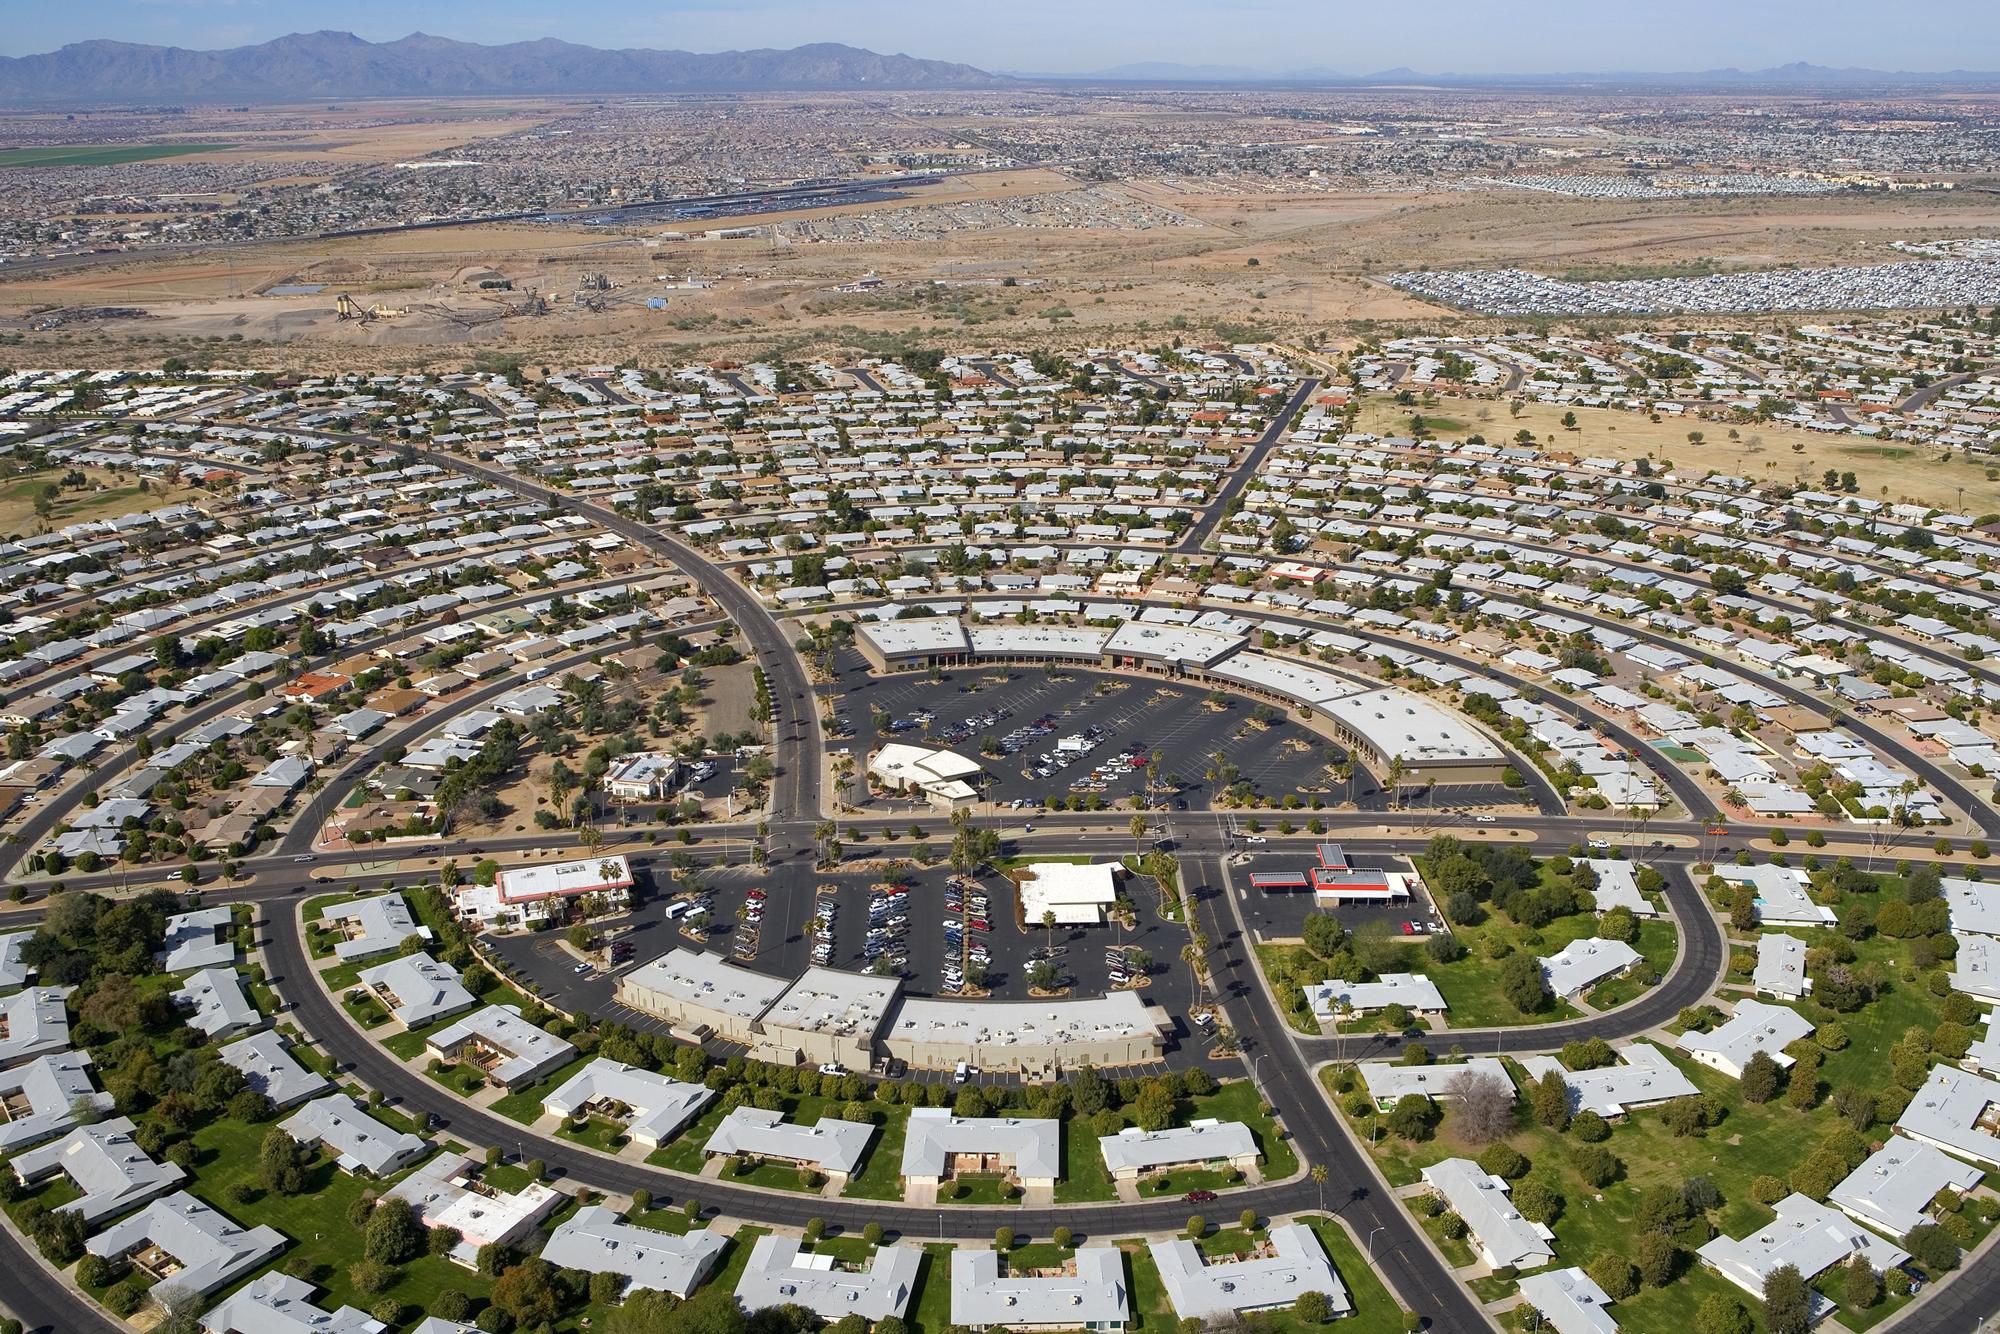 An aerial view of Sun City, Arizona.